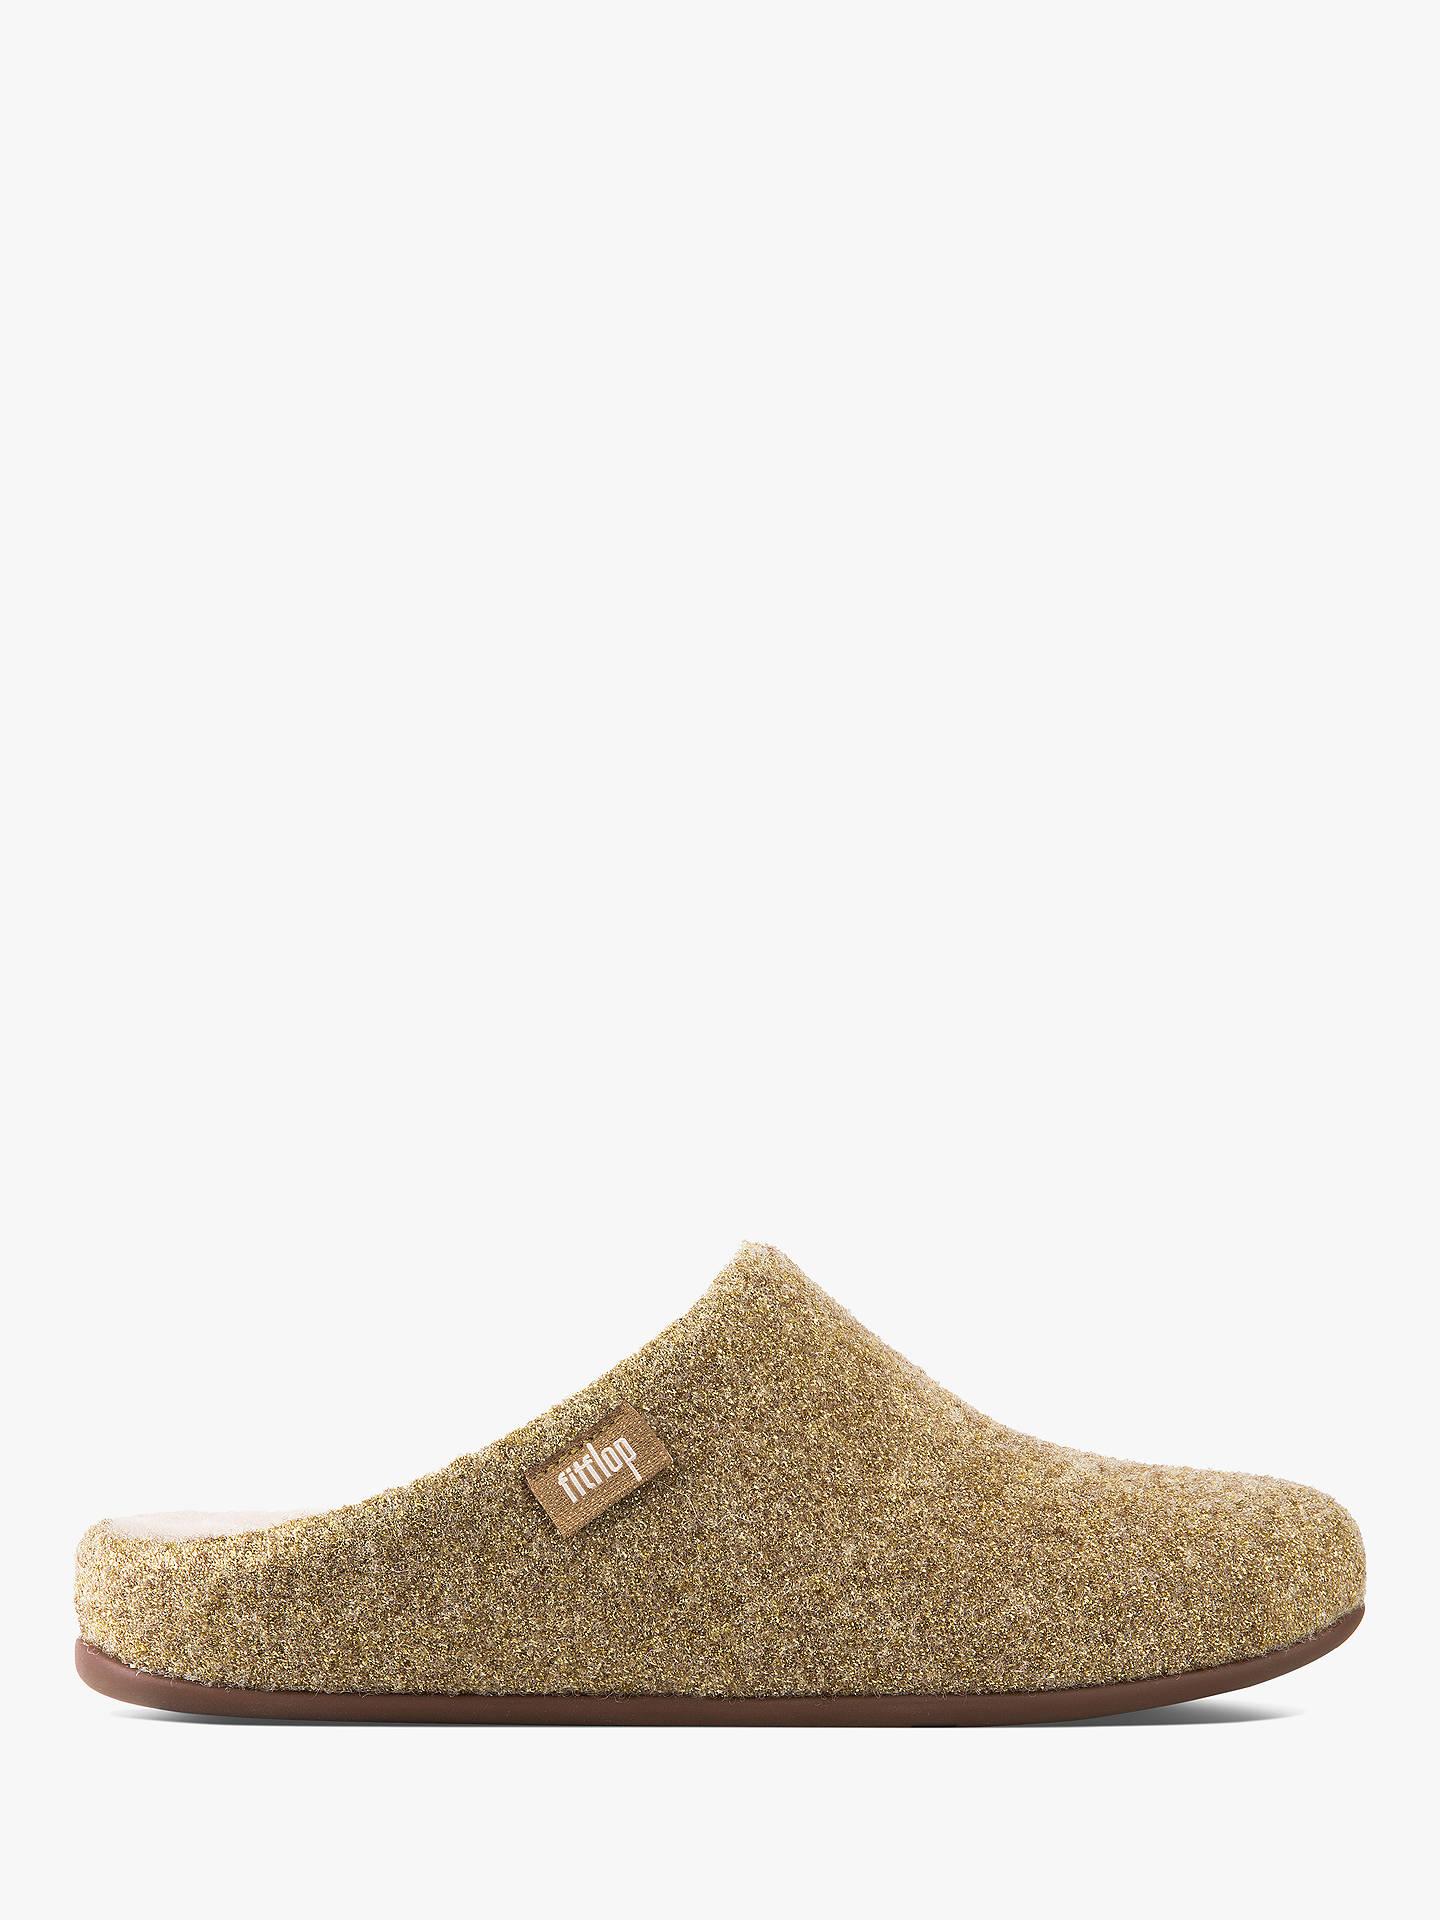 3c6da2386 Buy Fitflop Chrissie Shiny Woollen Slippers